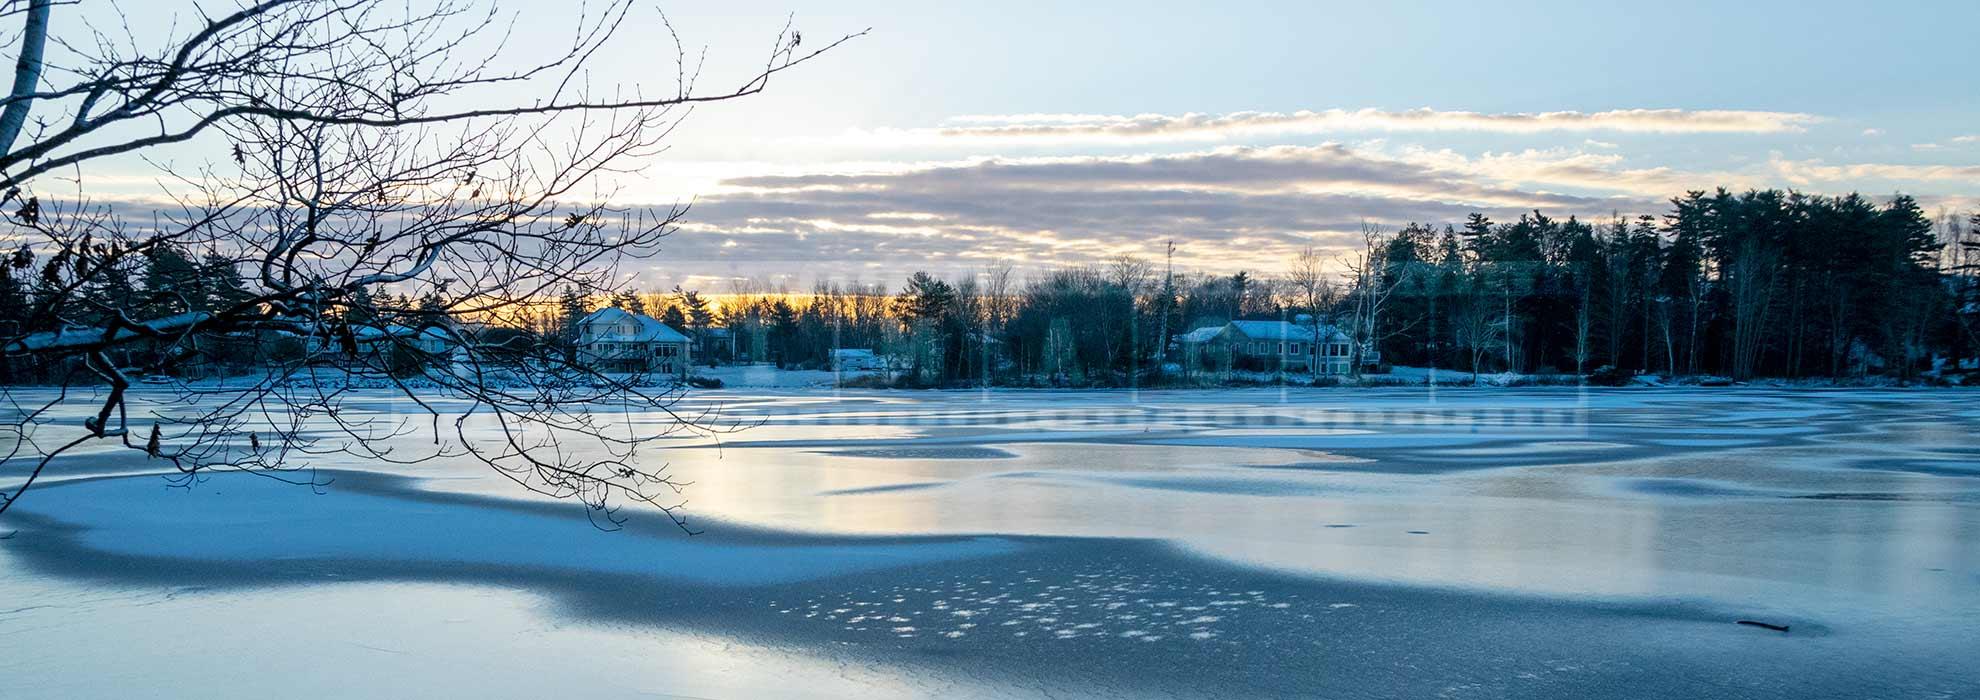 Winter scene - sunrise above frozen lake in Sackville, NS, Canada